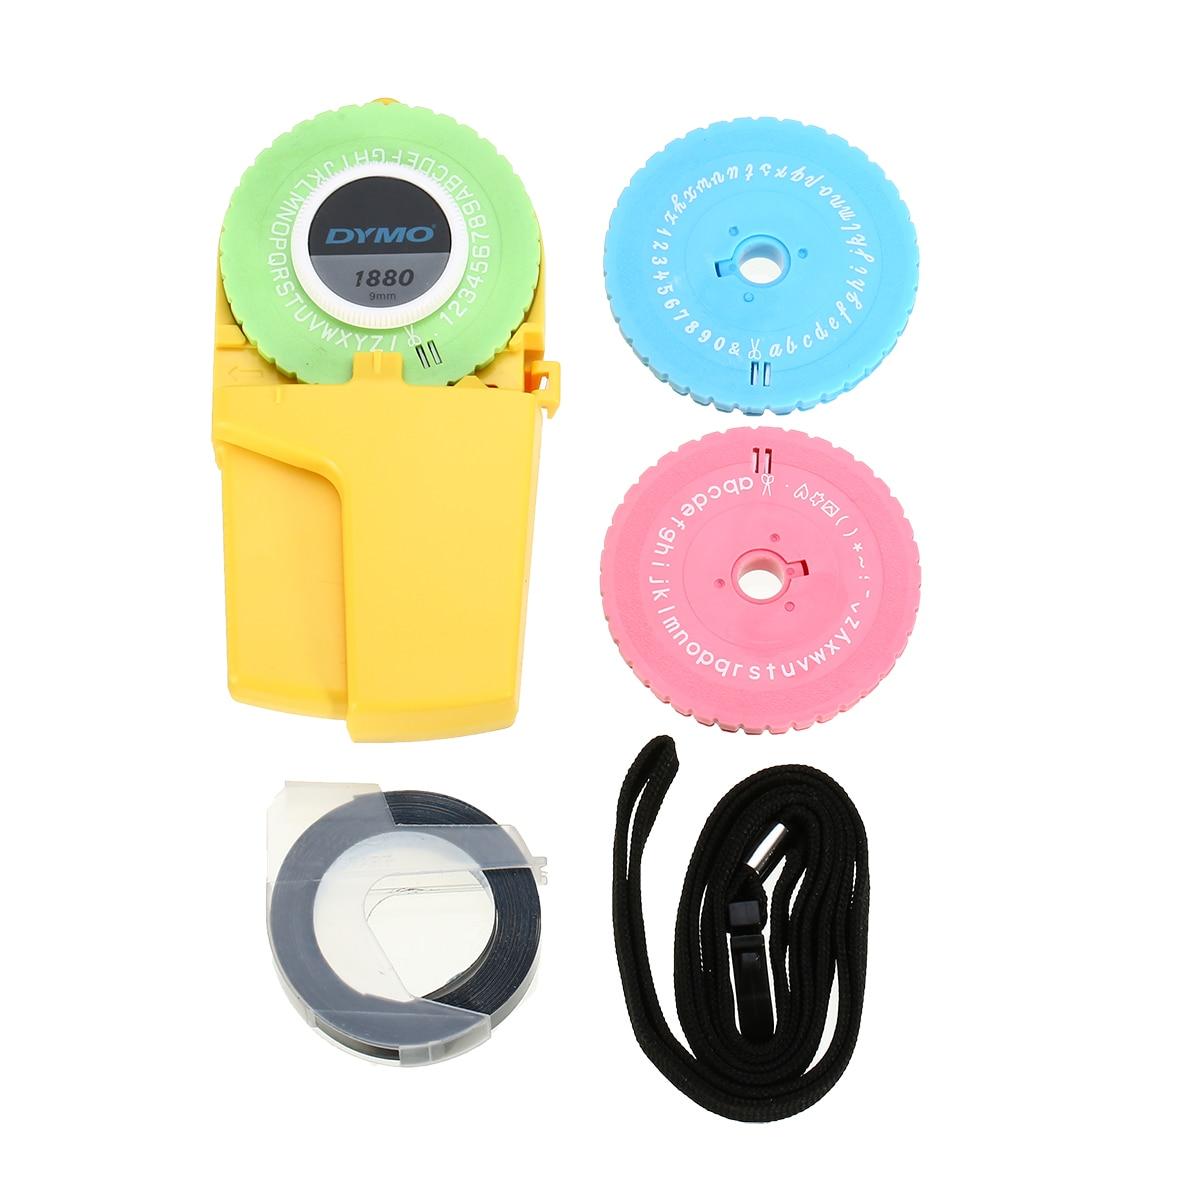 1 Set DIY Label Maker Tape Embossing Label Maker Manual Embossing 3 Word Dishes + 1 Label Refill